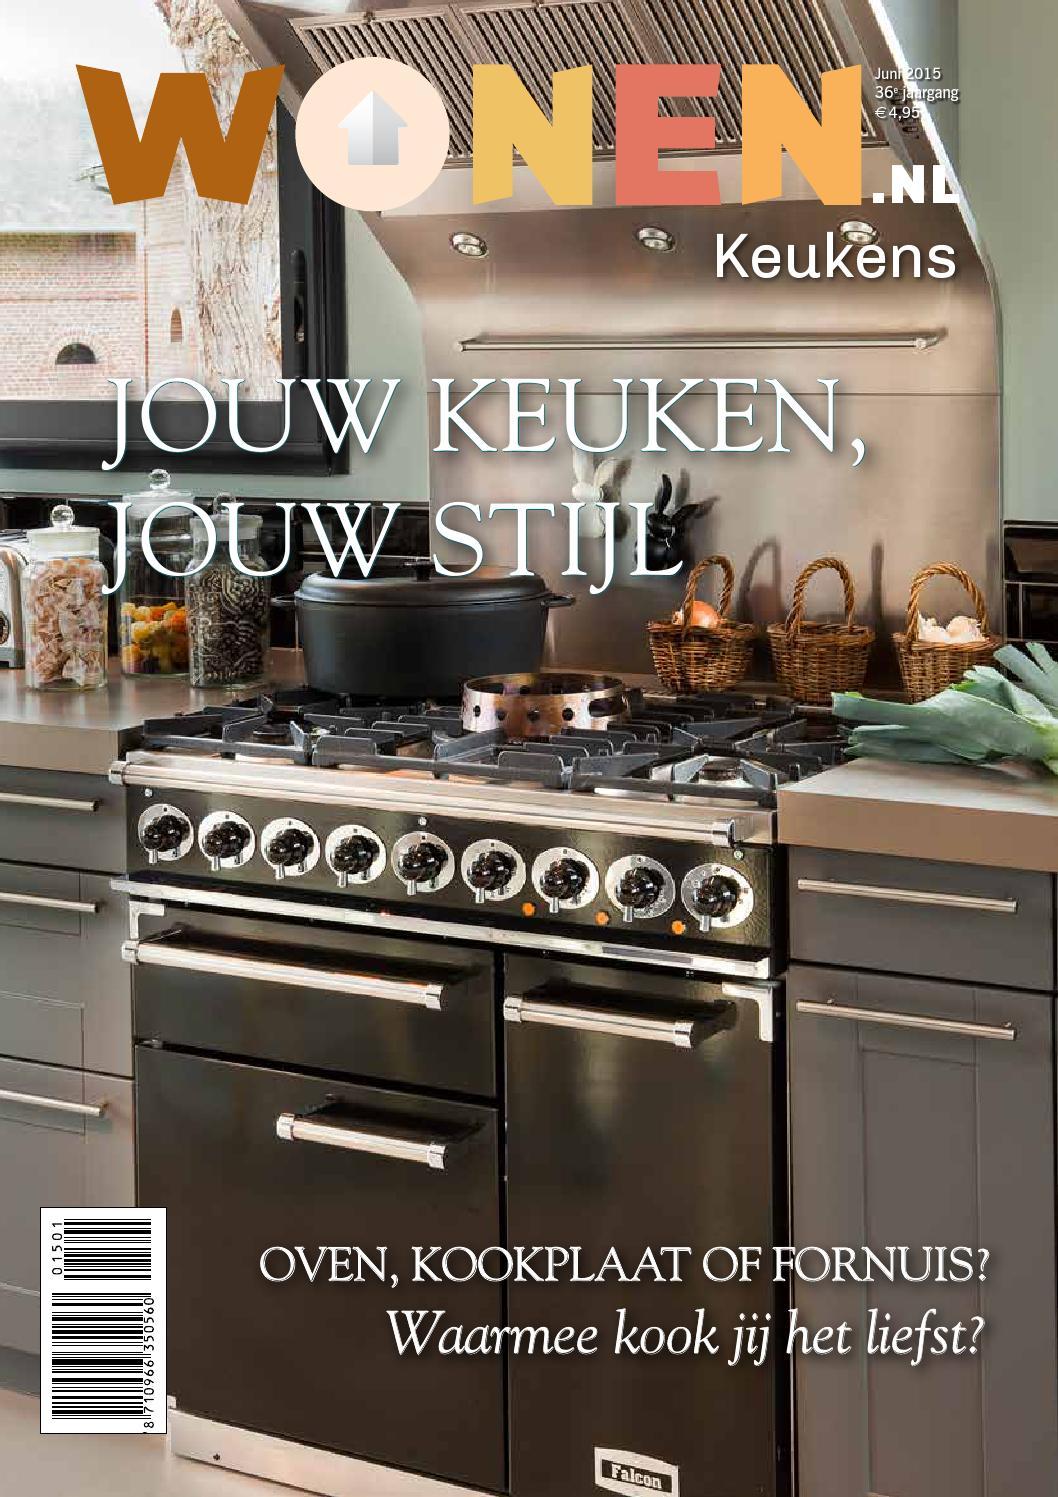 Wonen   keukens by wonen media   issuu